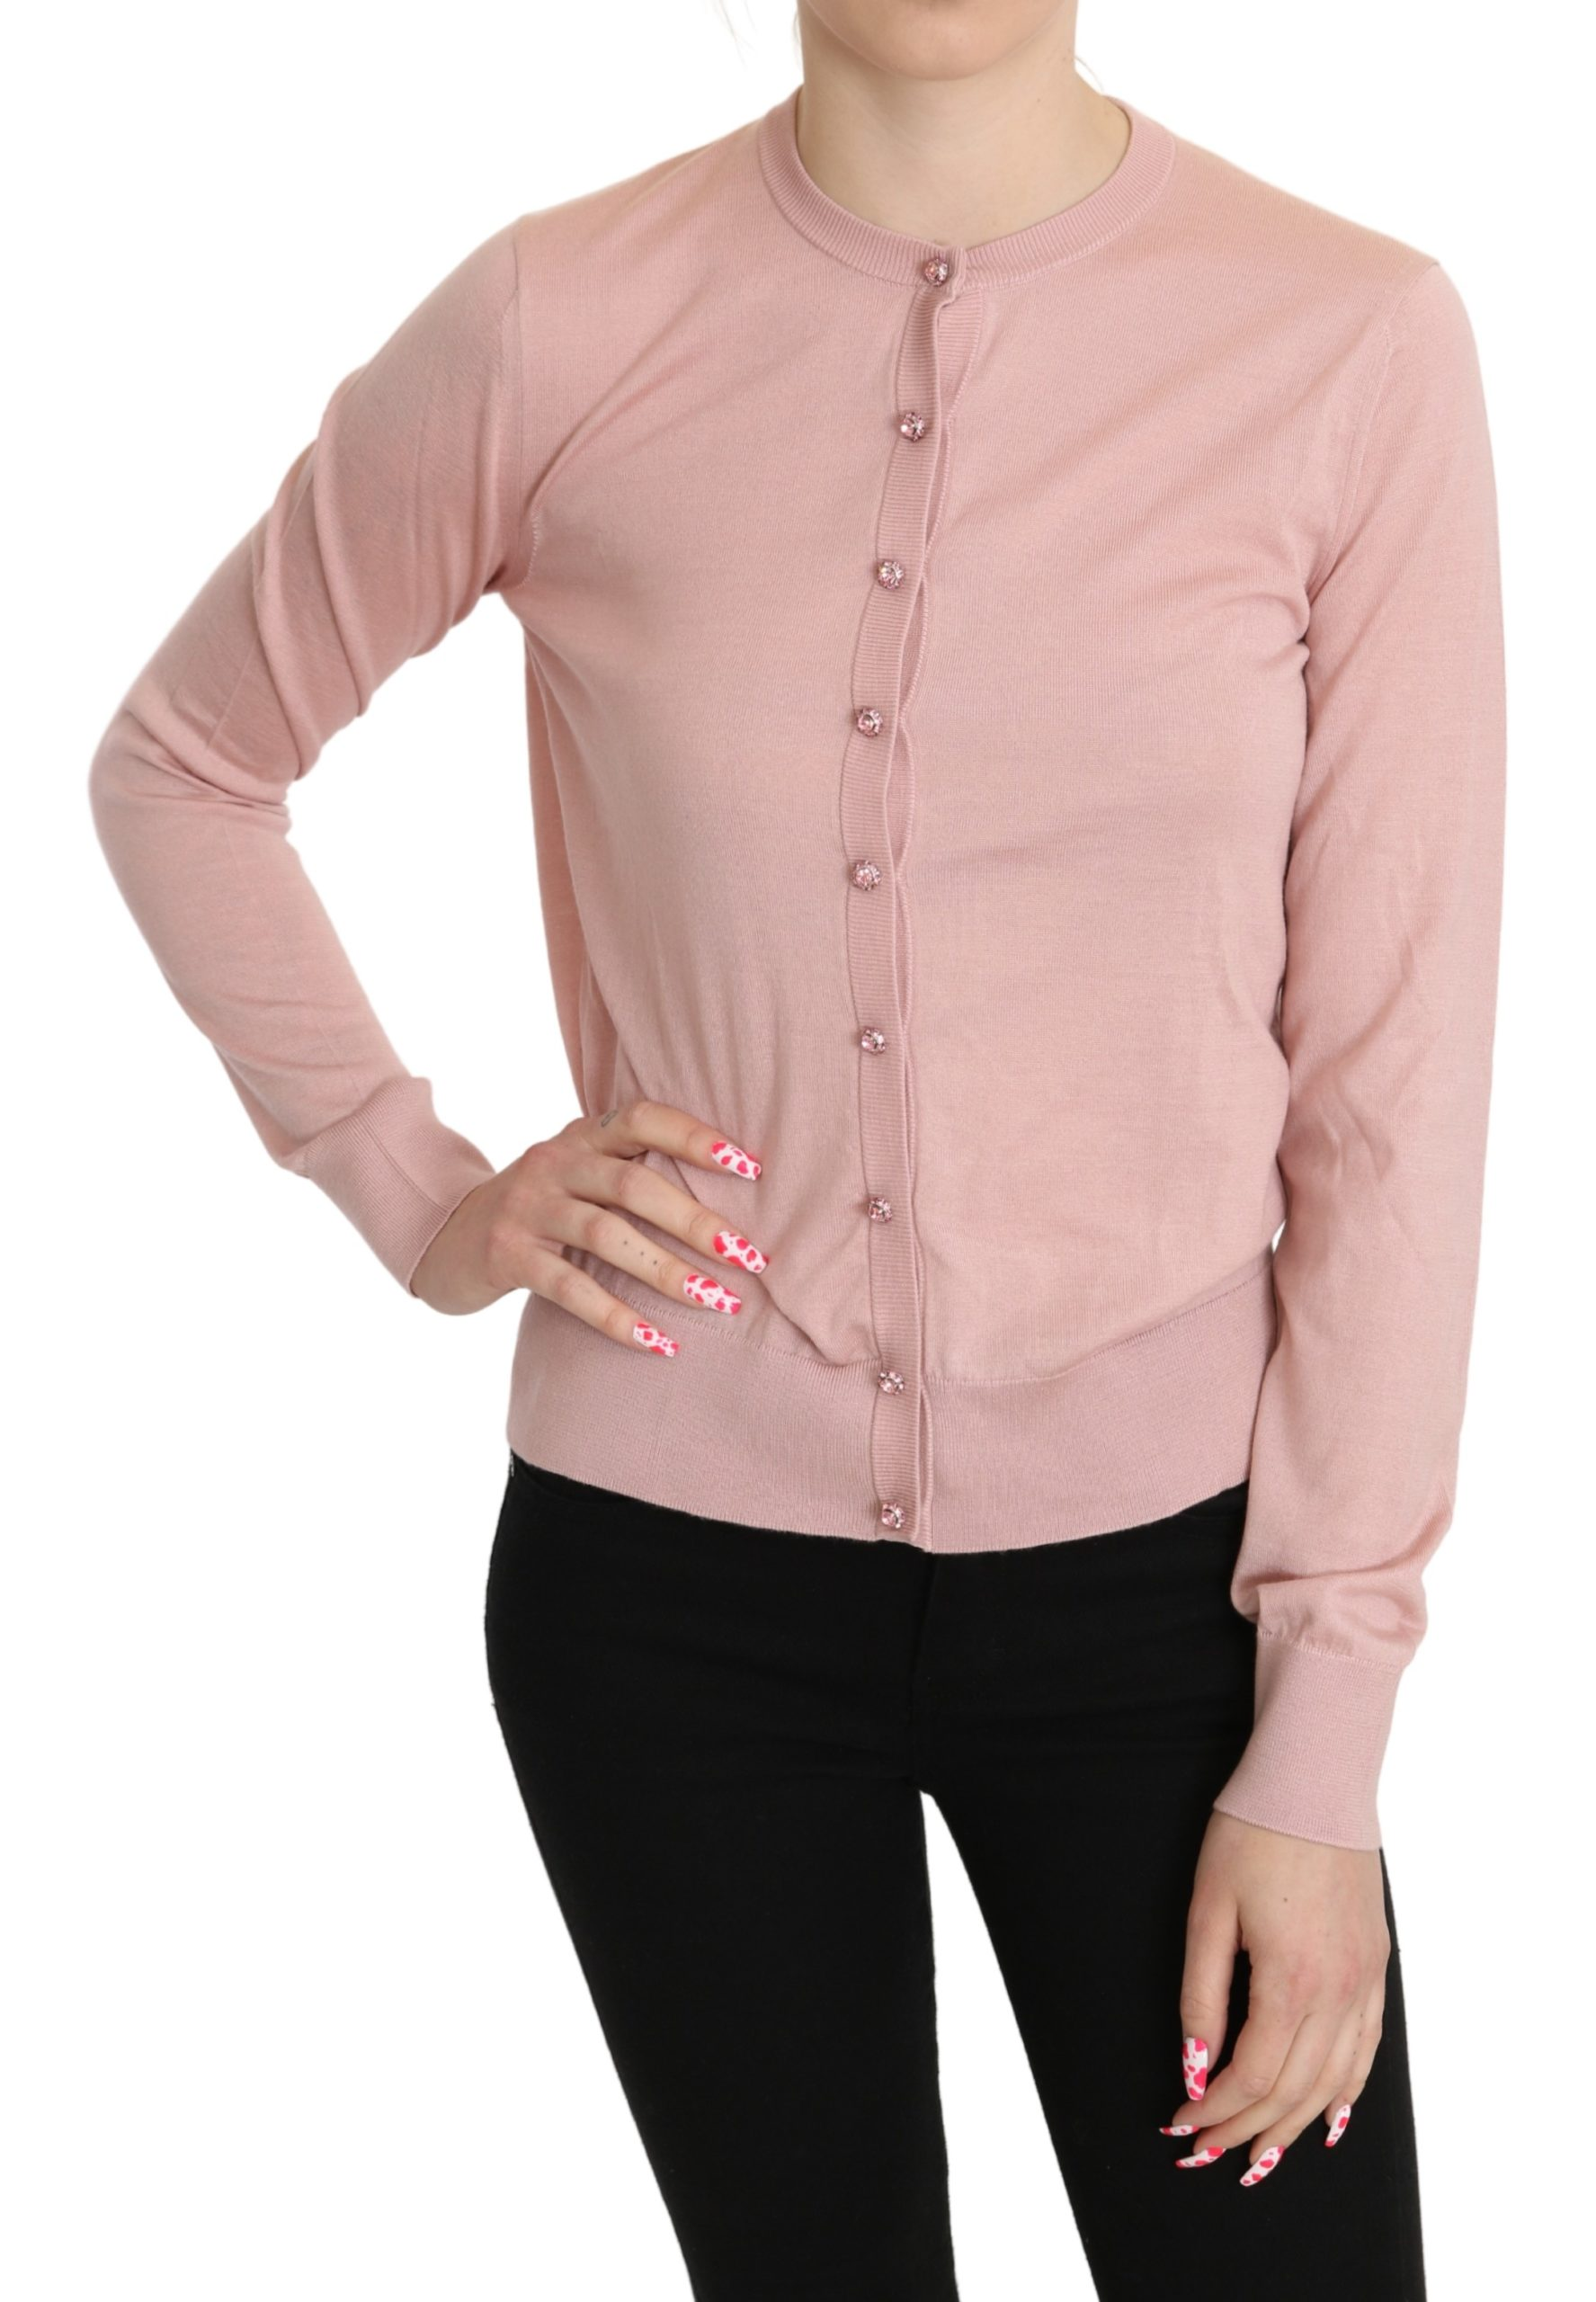 Dolce & Gabbana Women's Cashmere Silk Crystal Cardigan Pink TSH5248 - IT42|M